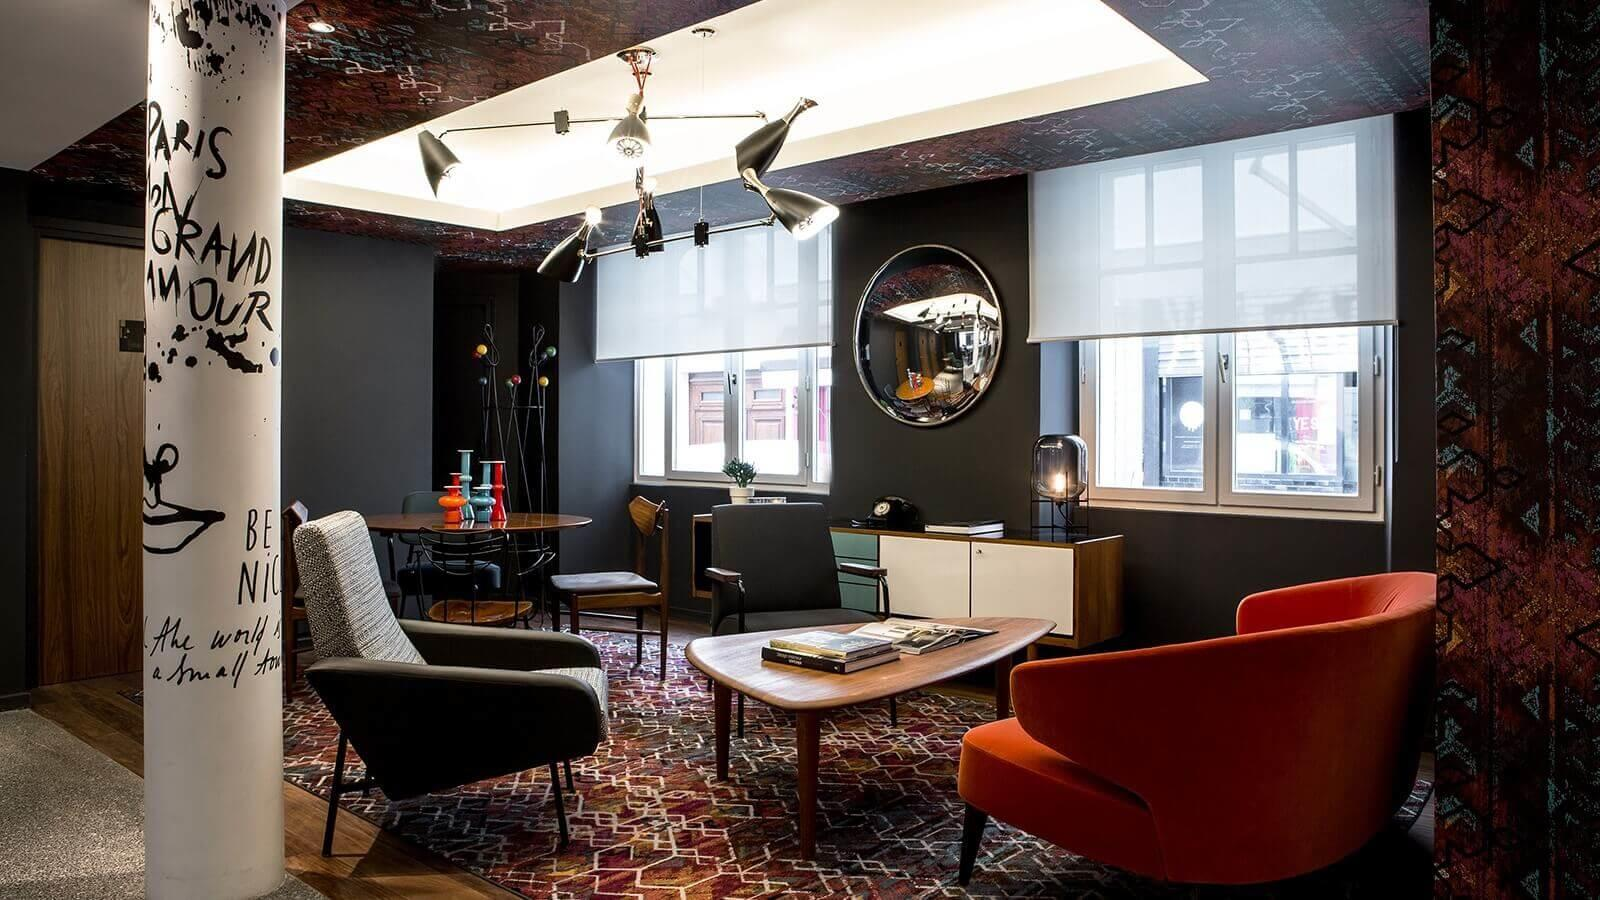 Le General Hotel Paris **** | OFFICIAL SITE | 4-star Hotel